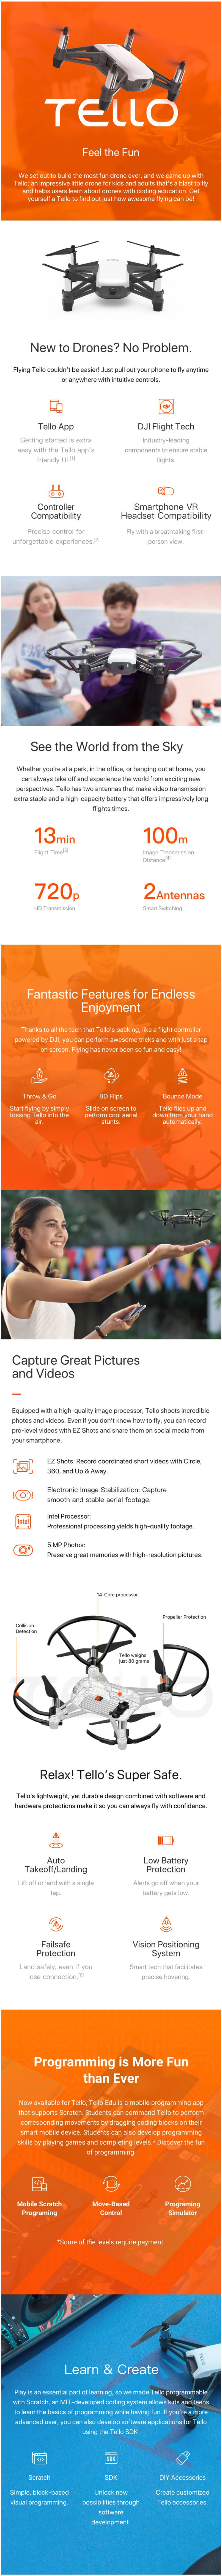 DJI Tello Drone Boost Combo - Desktop Overview 1